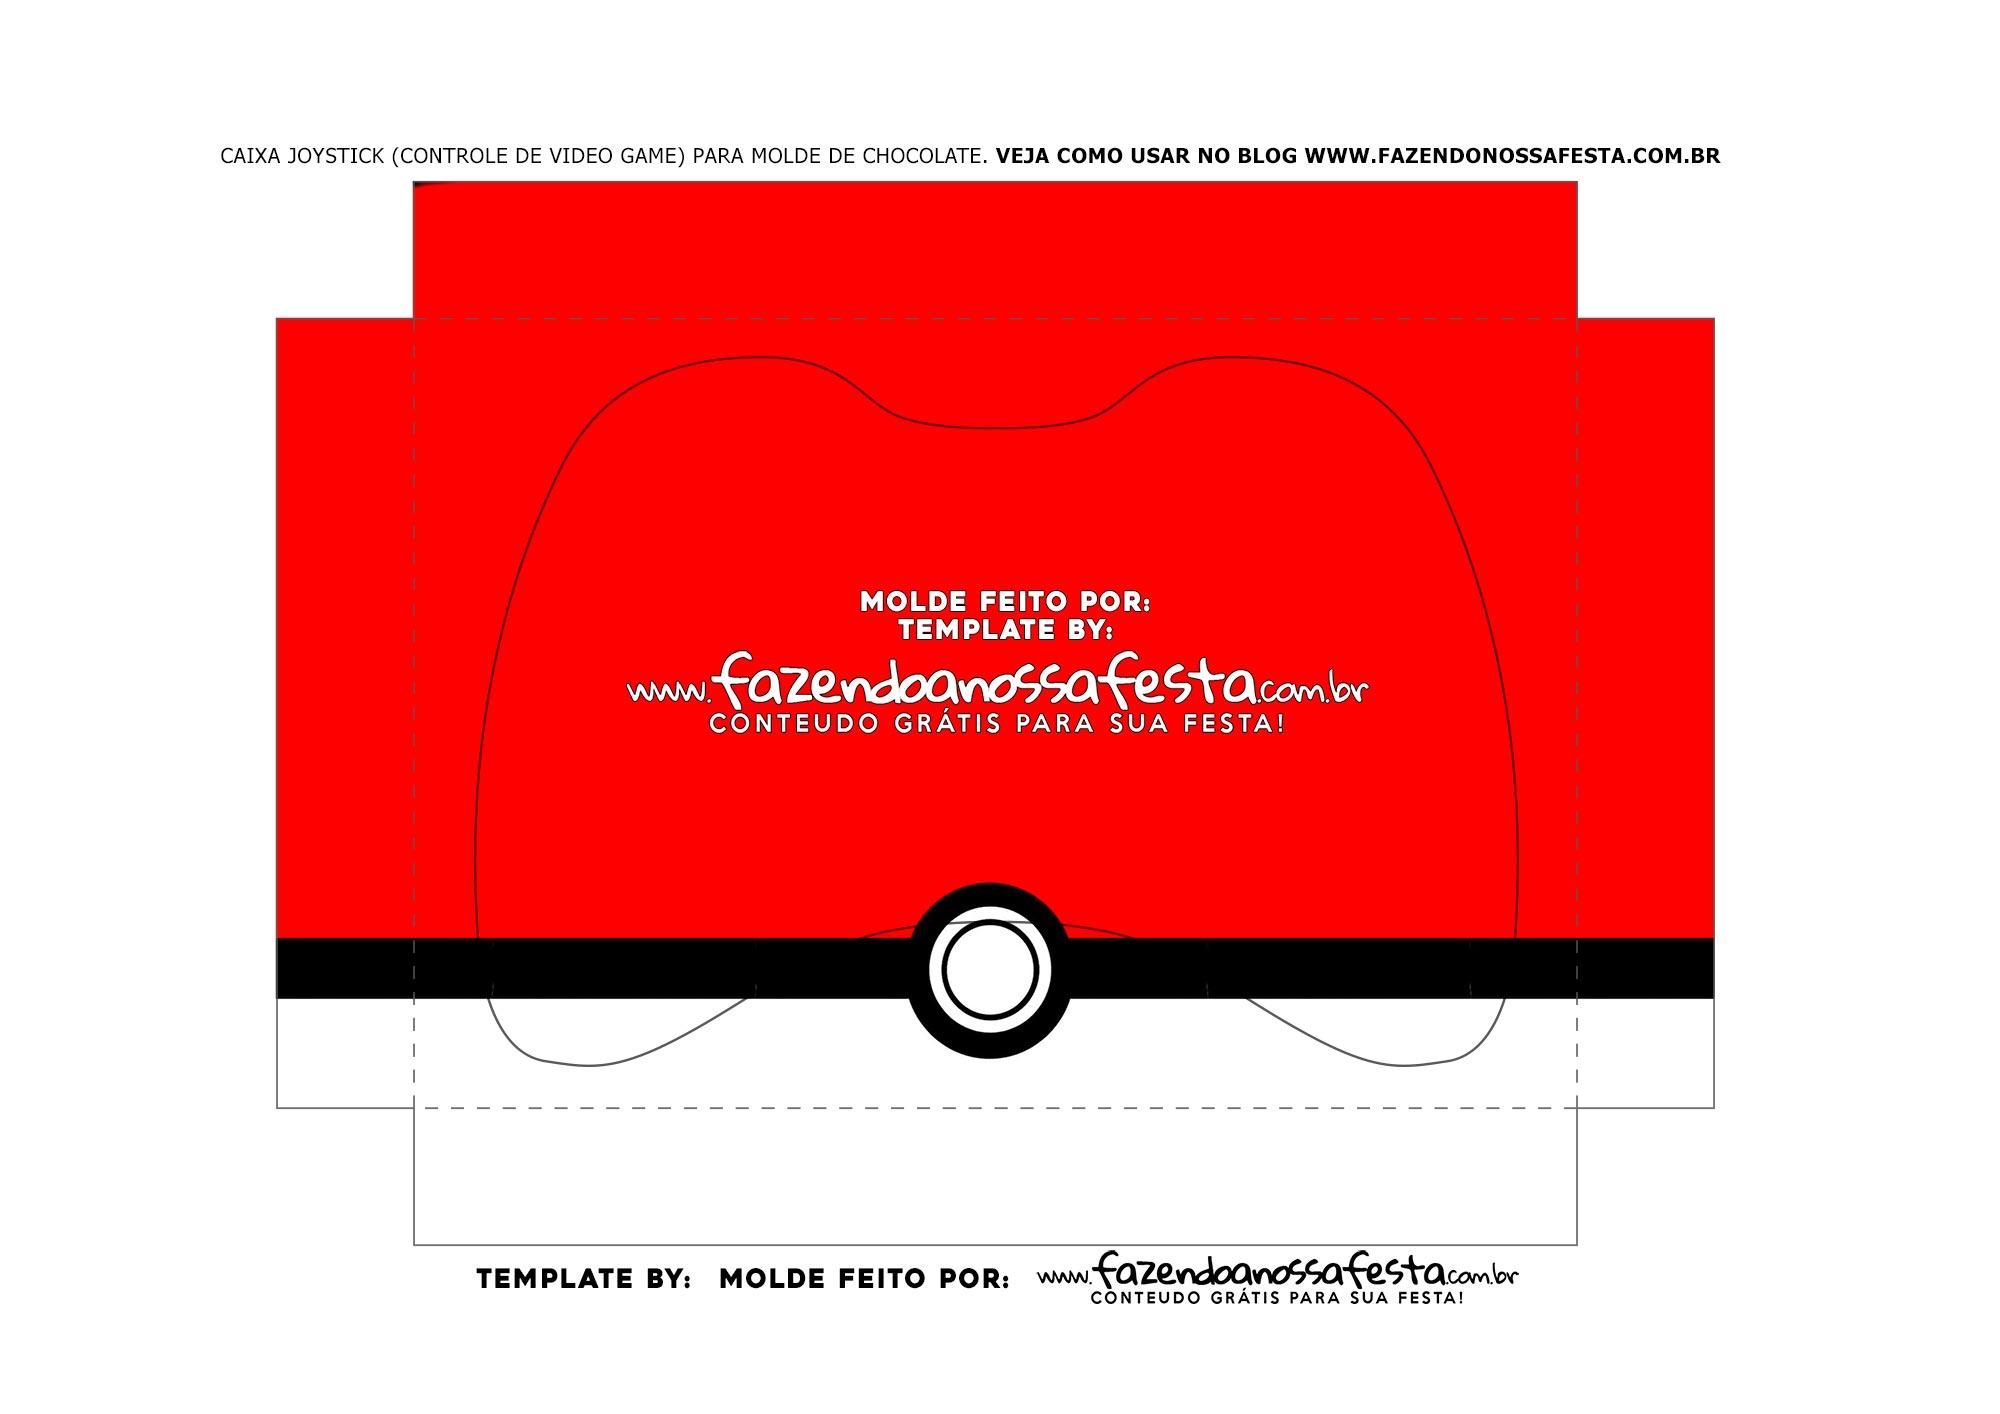 Berco Caixa Controle de Chocolate Xbox Pokemon